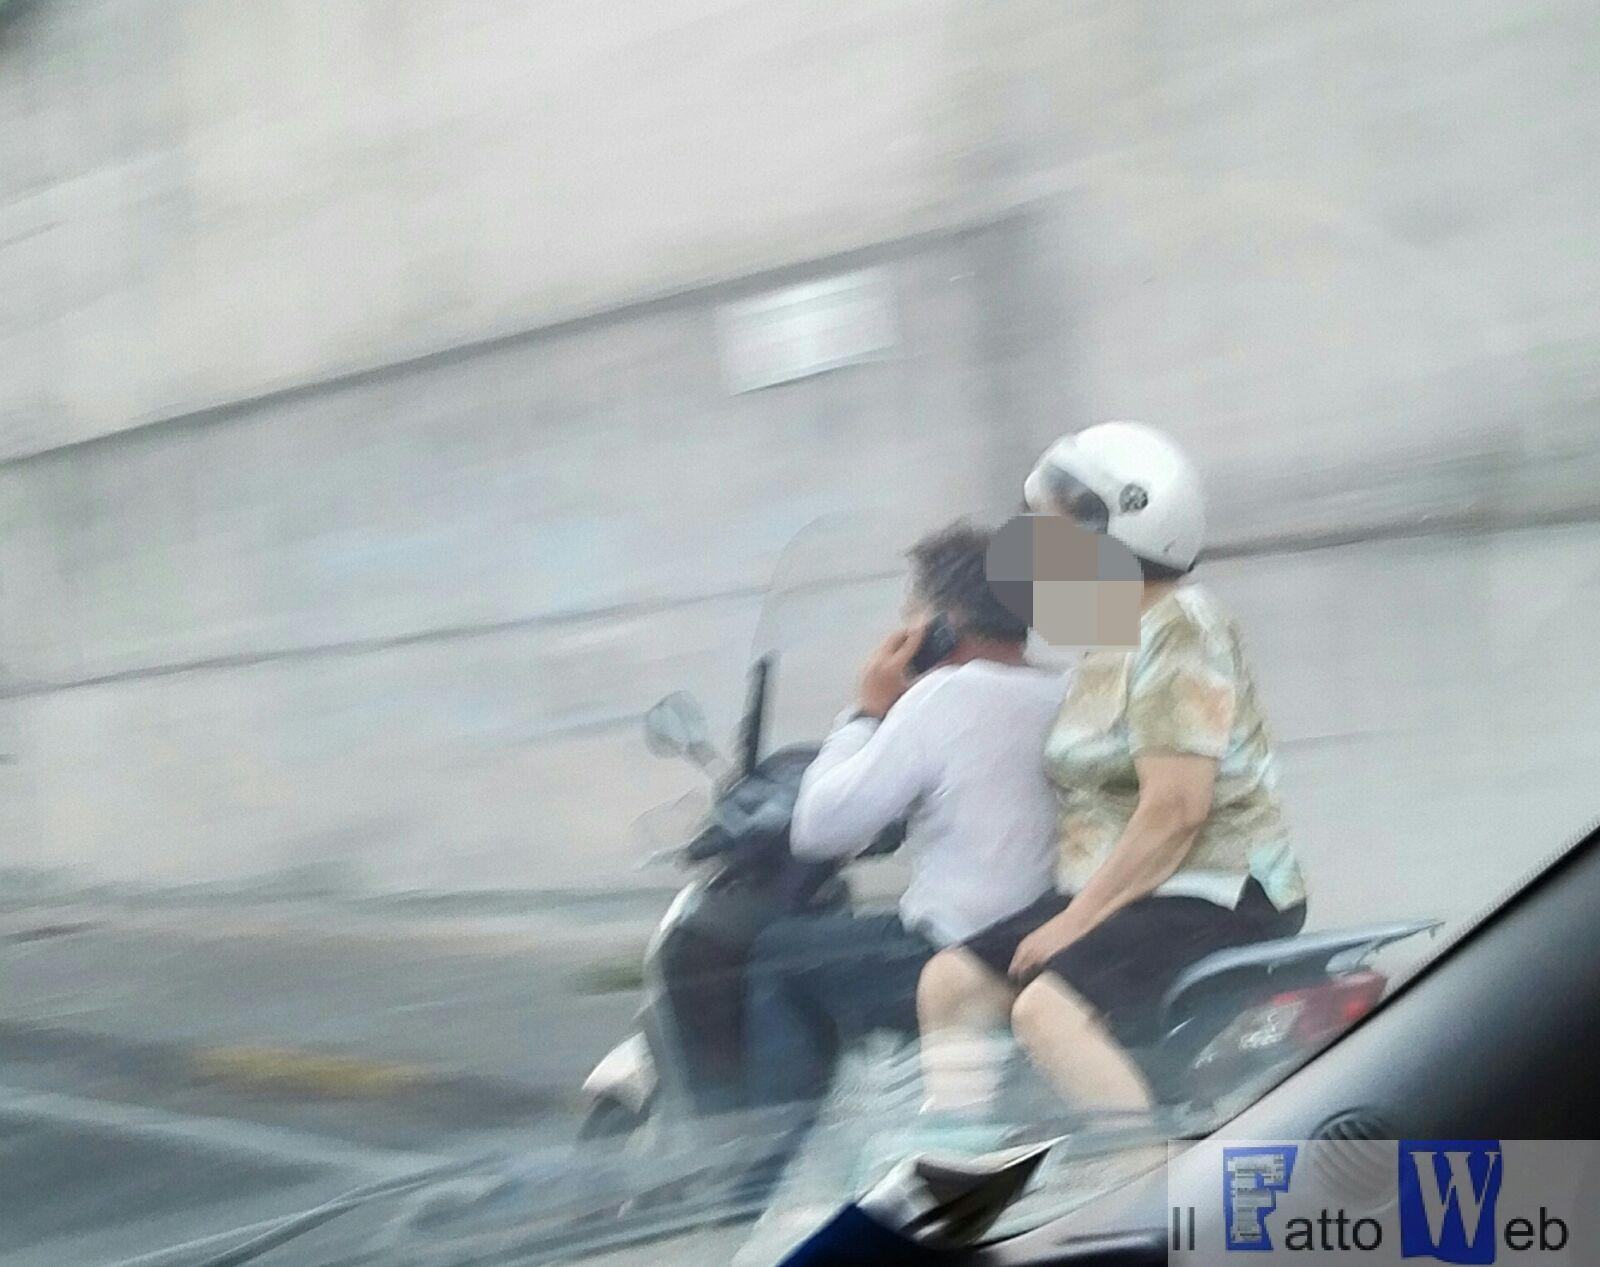 #CataniaFaiDaTe Sicurezza Stradale questa sconosciuta